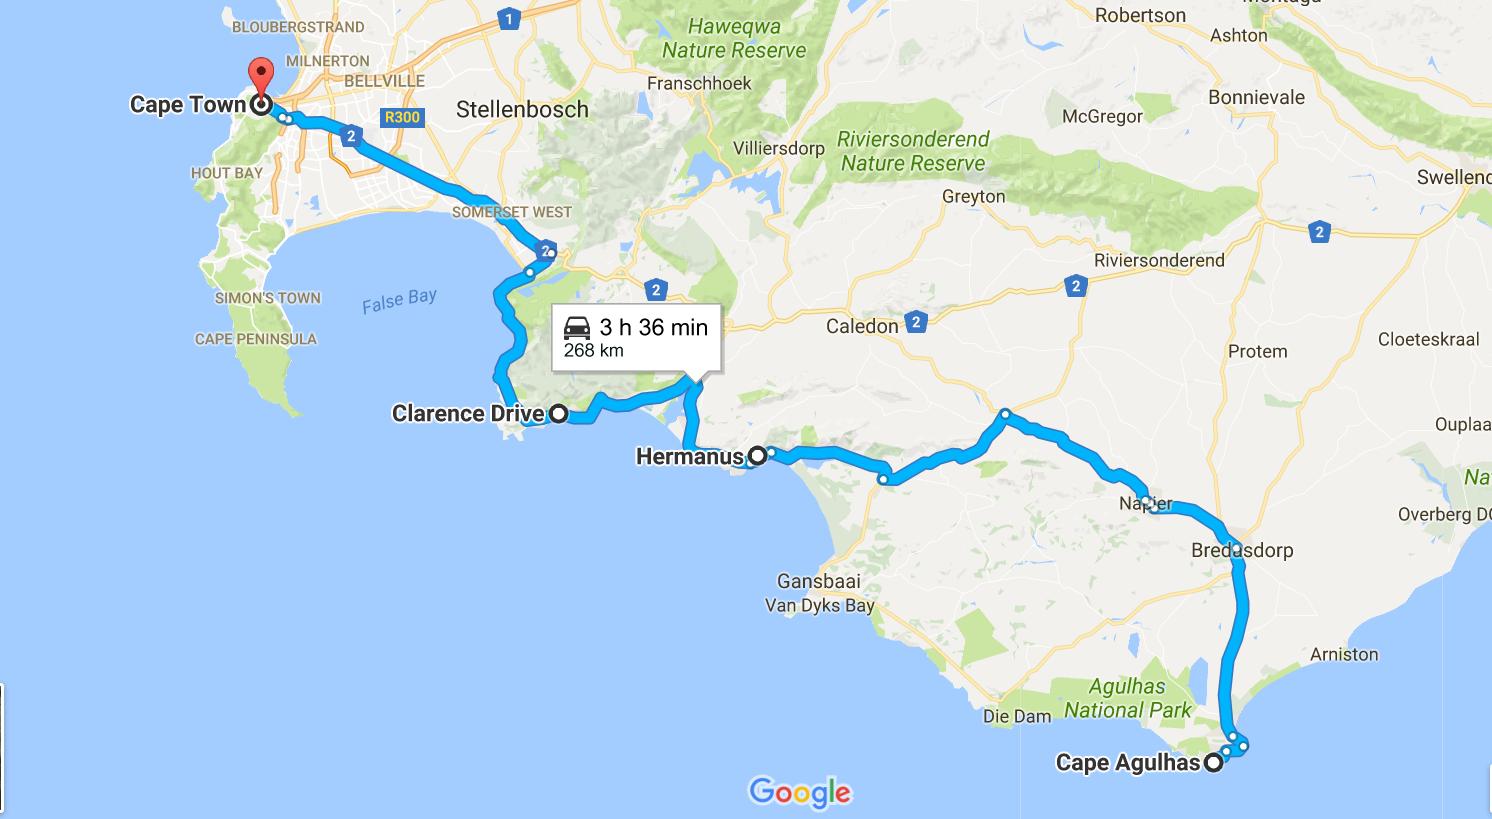 mapa_cape_town_para_cape_agulhas_passando_clarens_drive